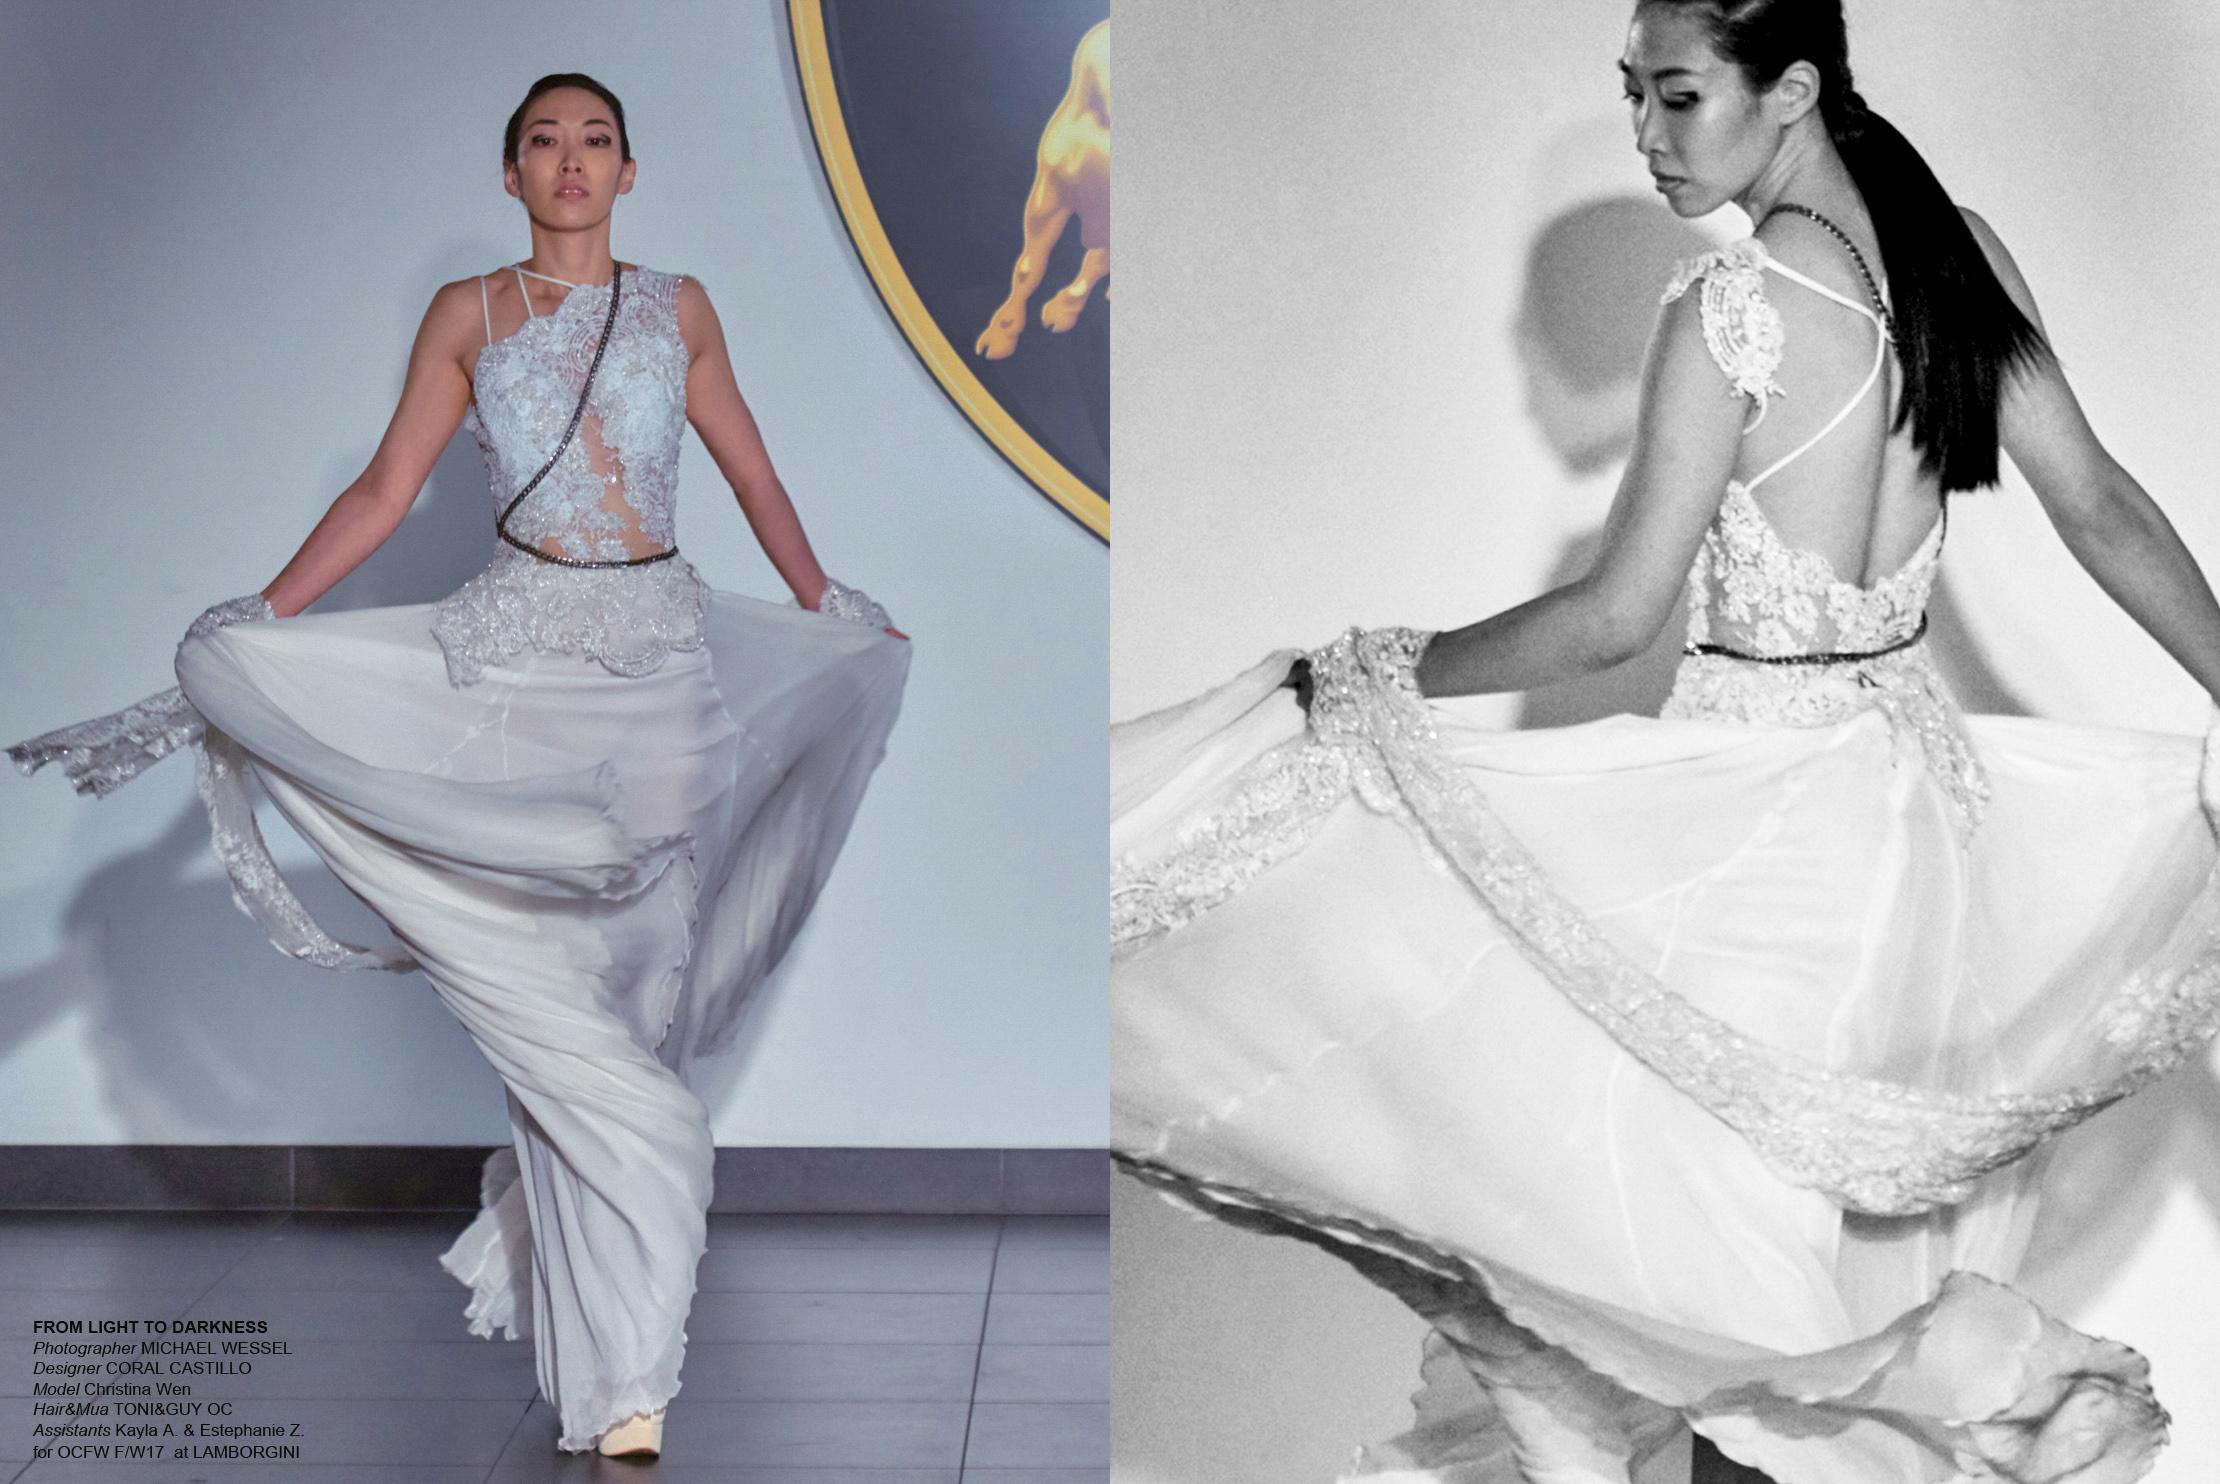 Coral Castillo - OC Fashion Week March 2017 - Photos by Michael Wessel & cREAtive Castle Studios (www.creativecastlestudios.com-Coral-Castillo and www.creativecastlestudios.com-michael-wessel)-11.jpg